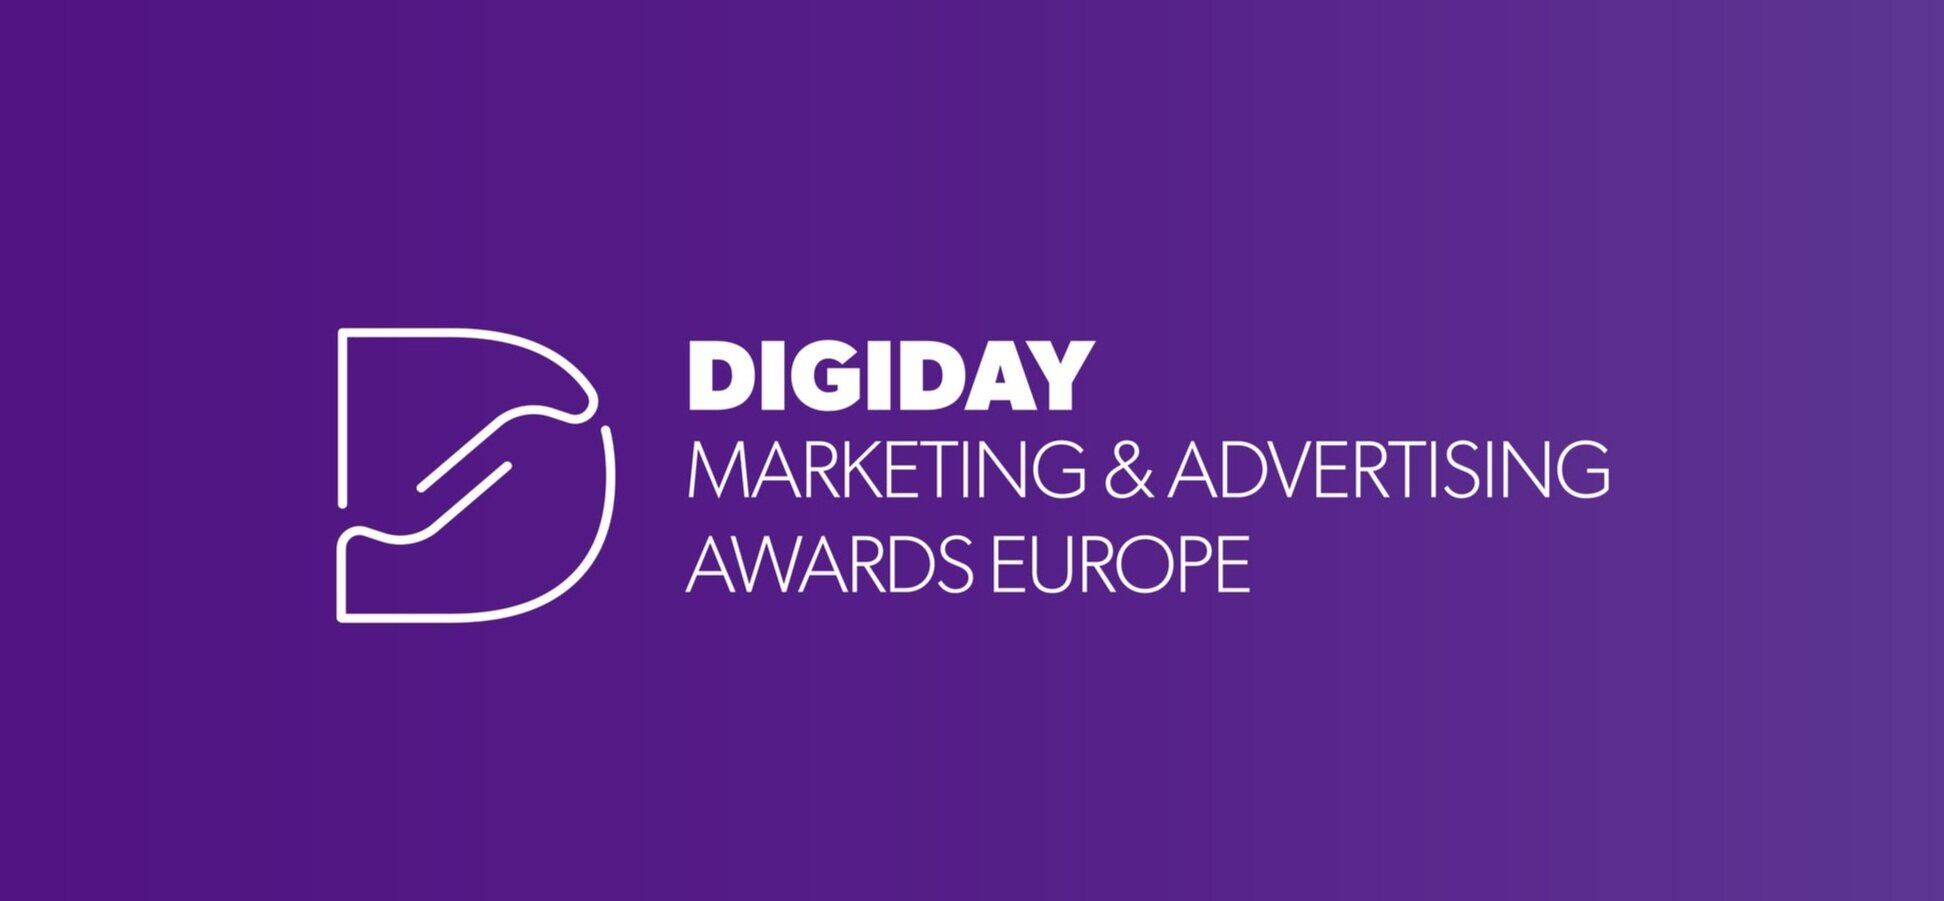 digiday-marketingadvertising-awards-europe.jpg